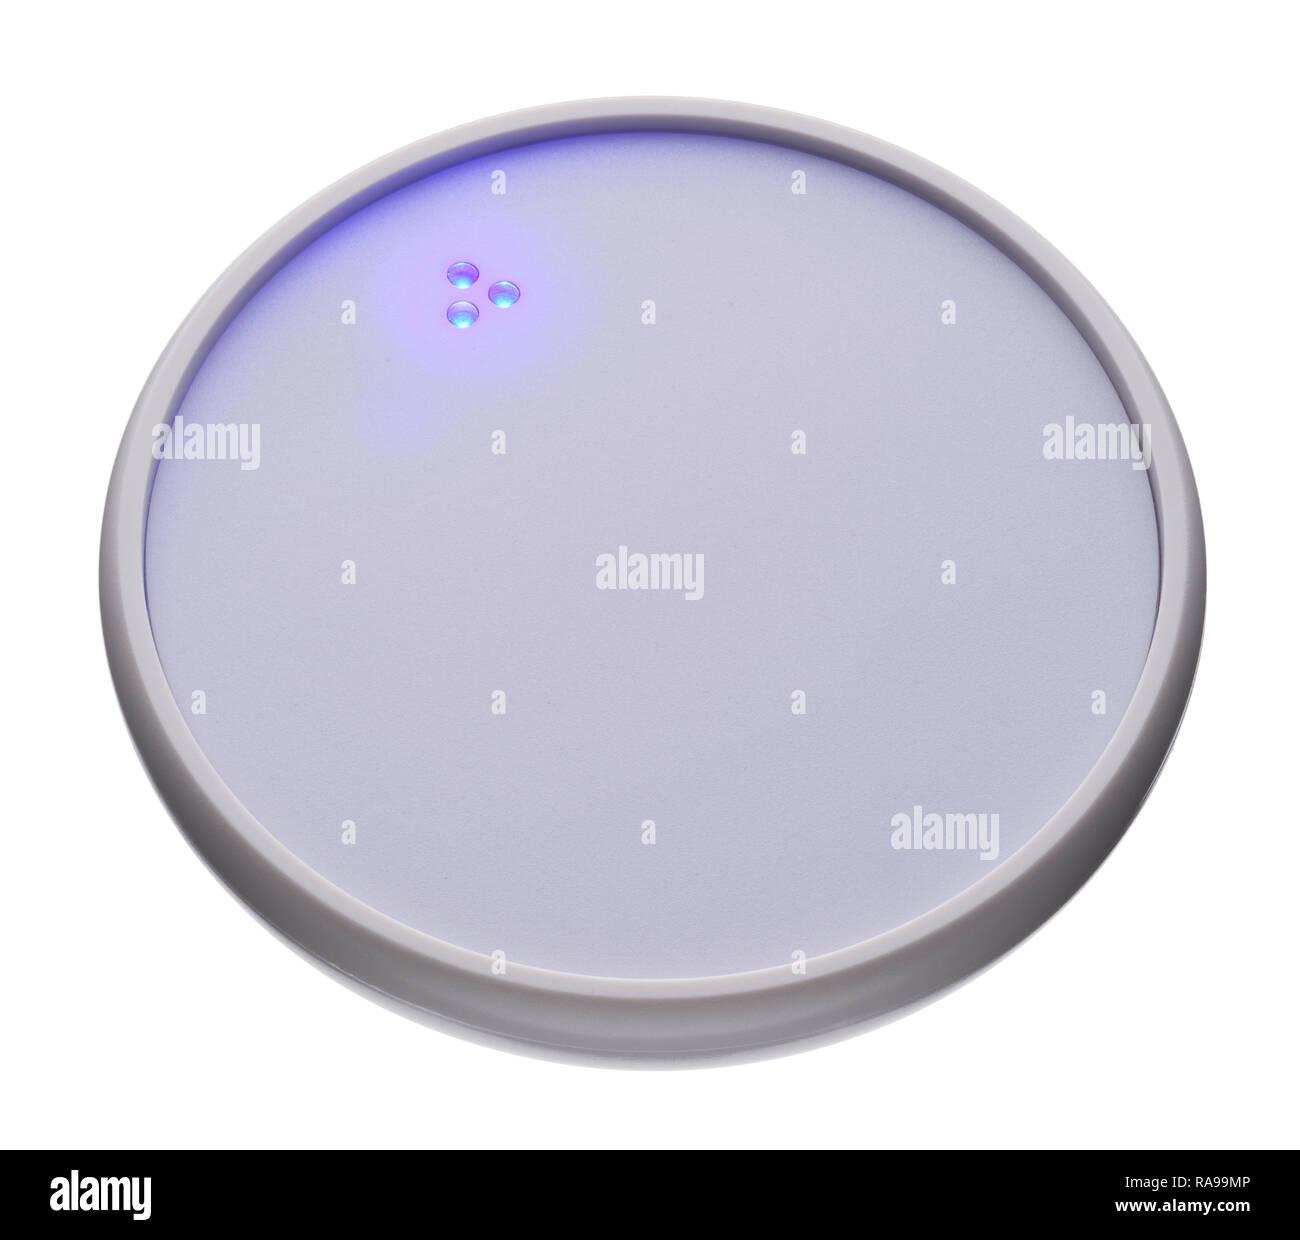 Dodow sleep aid device to help with insomnia. - Stock Image